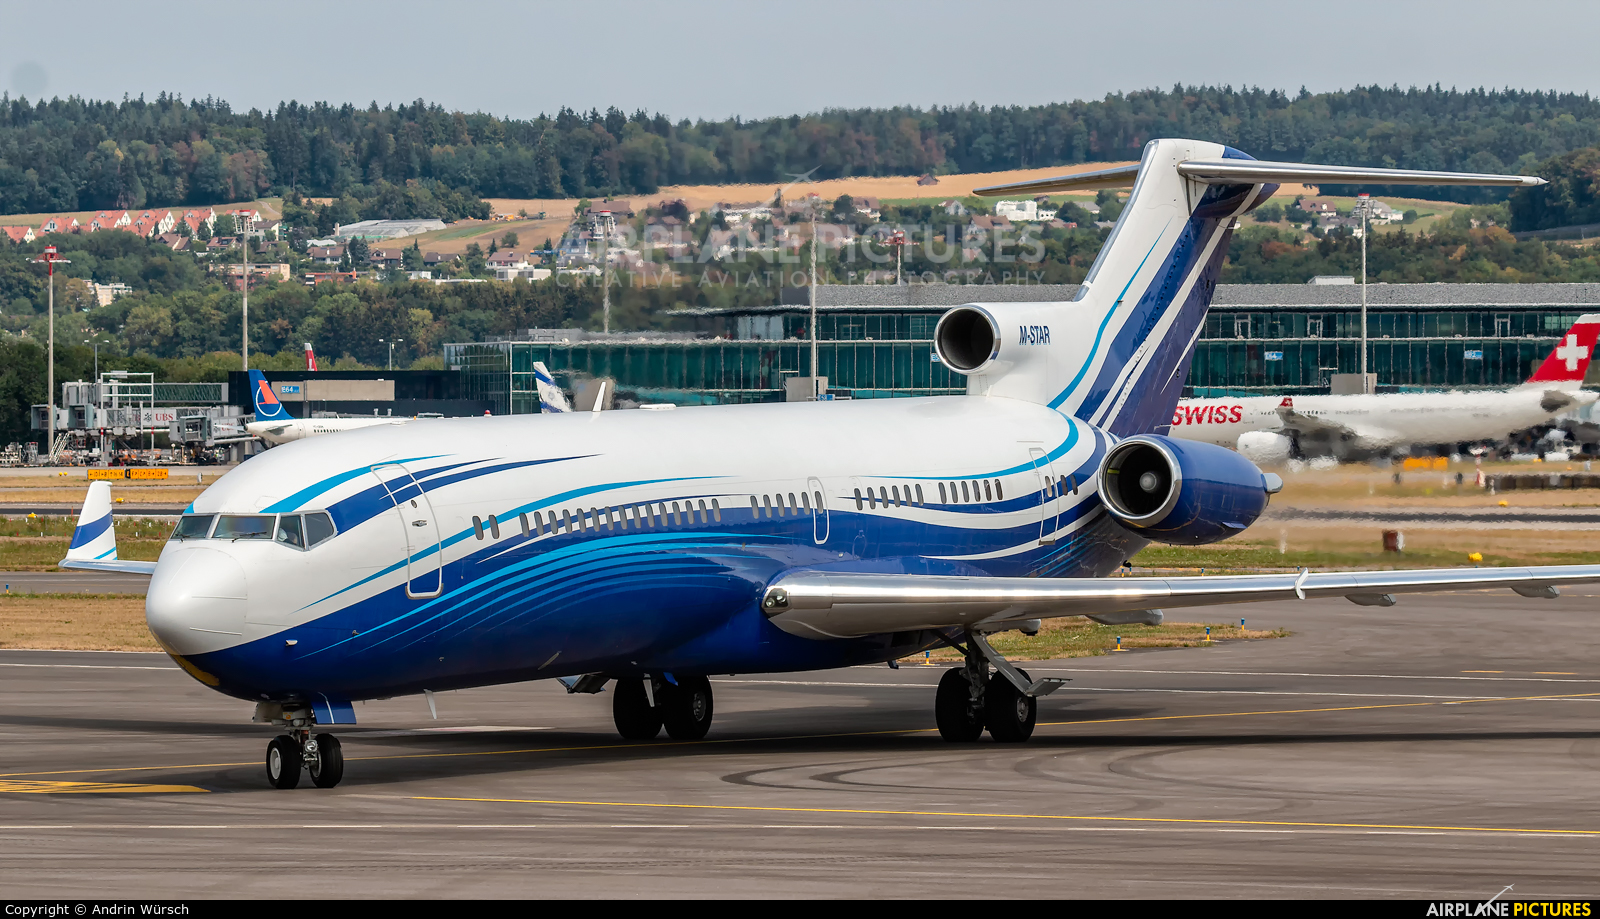 Starling Aviation M-STAR aircraft at Zurich